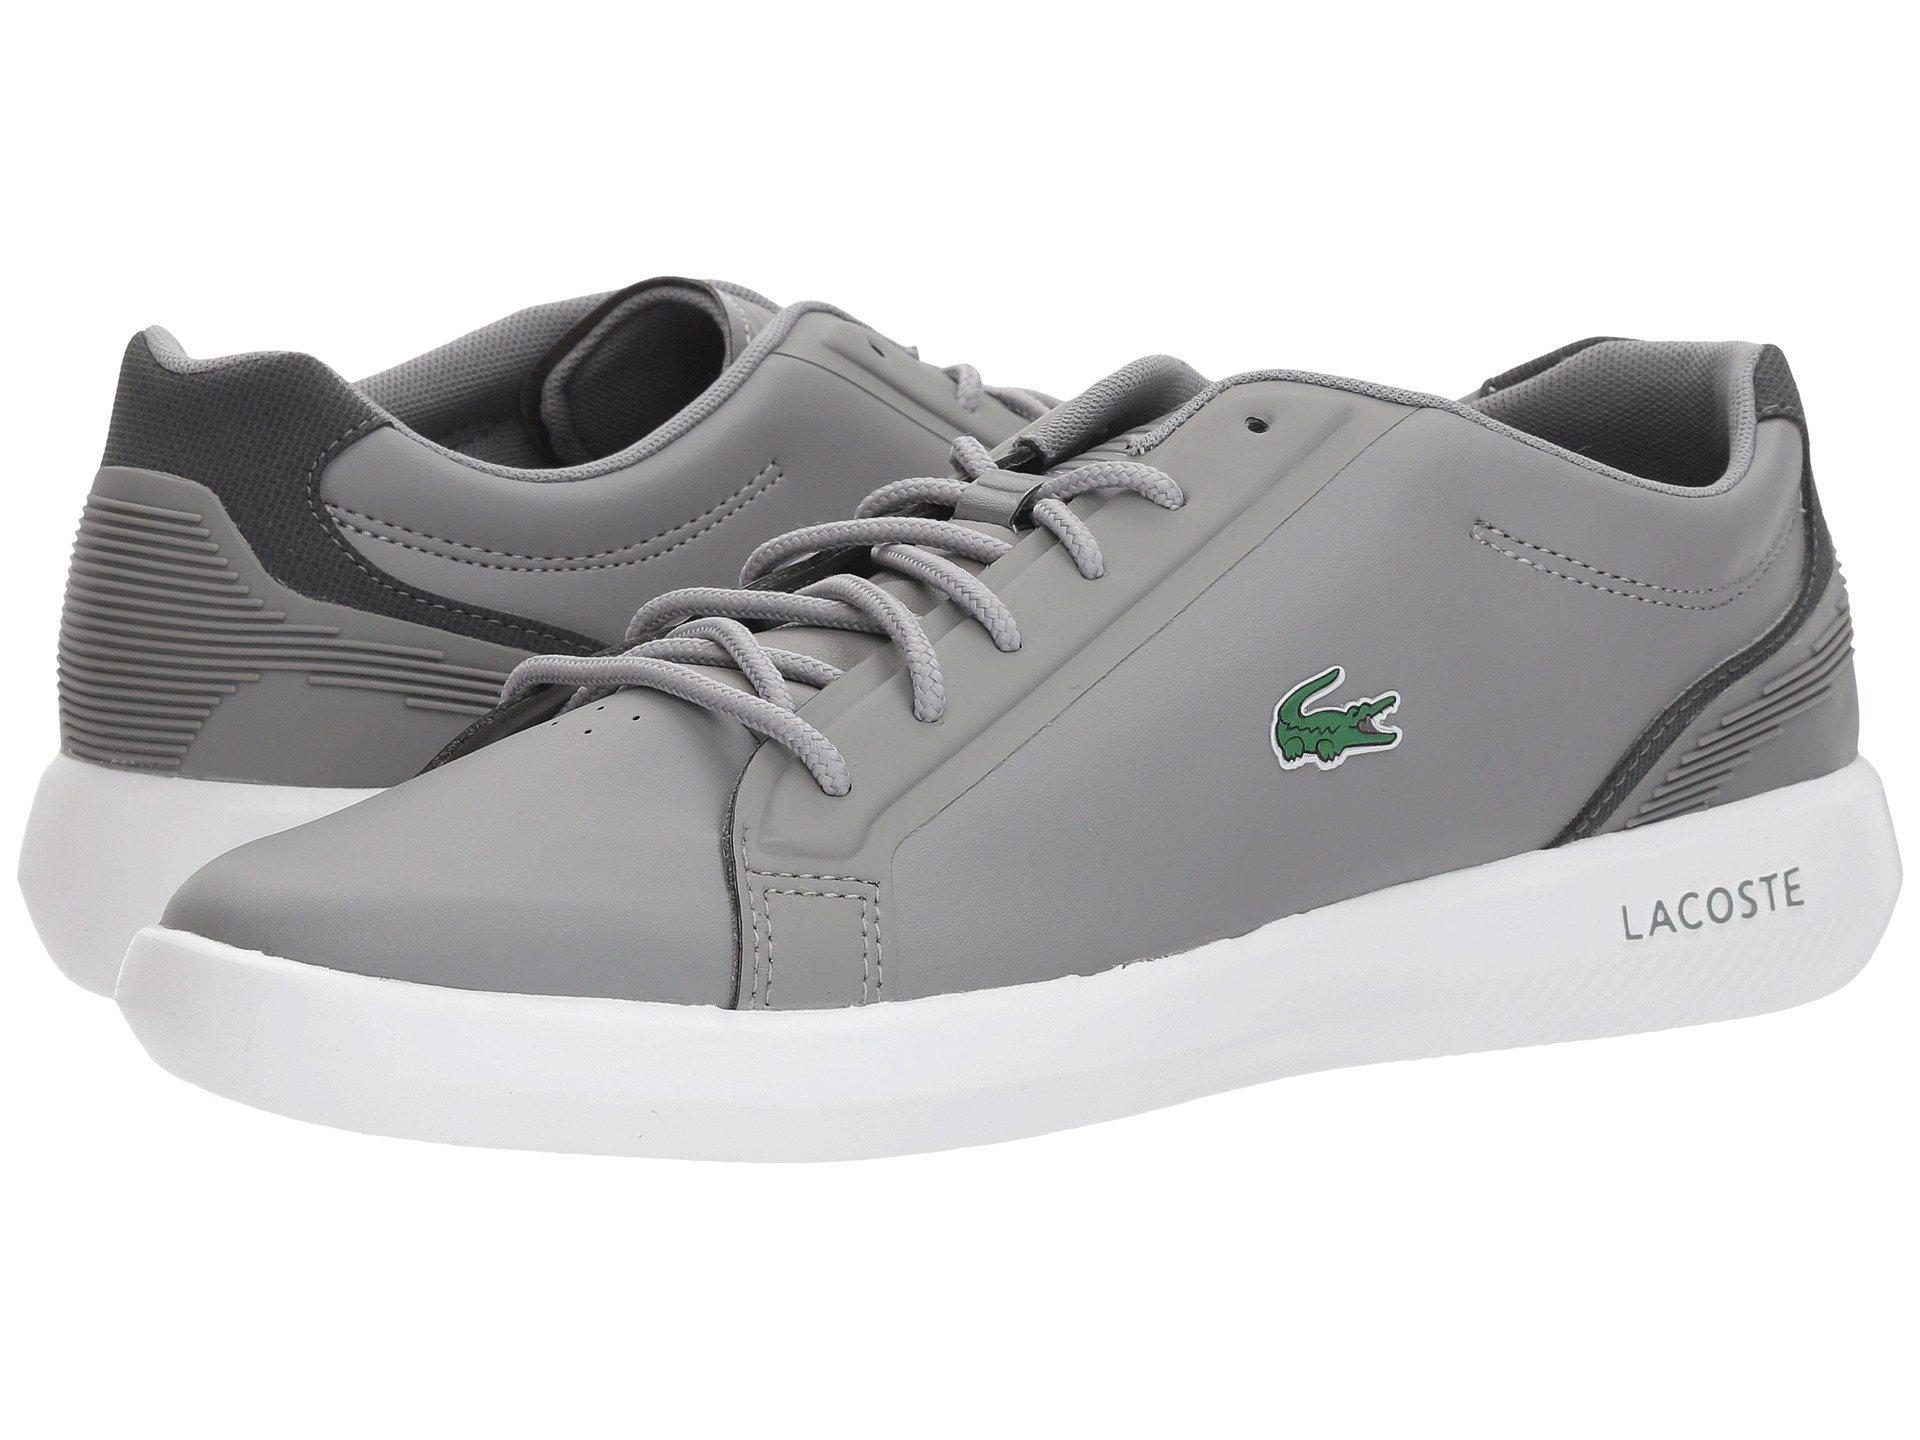 e78cdd0878 Lacoste Sneakers Men Lyst Save Avantor For In 's Gray TqB4vxP